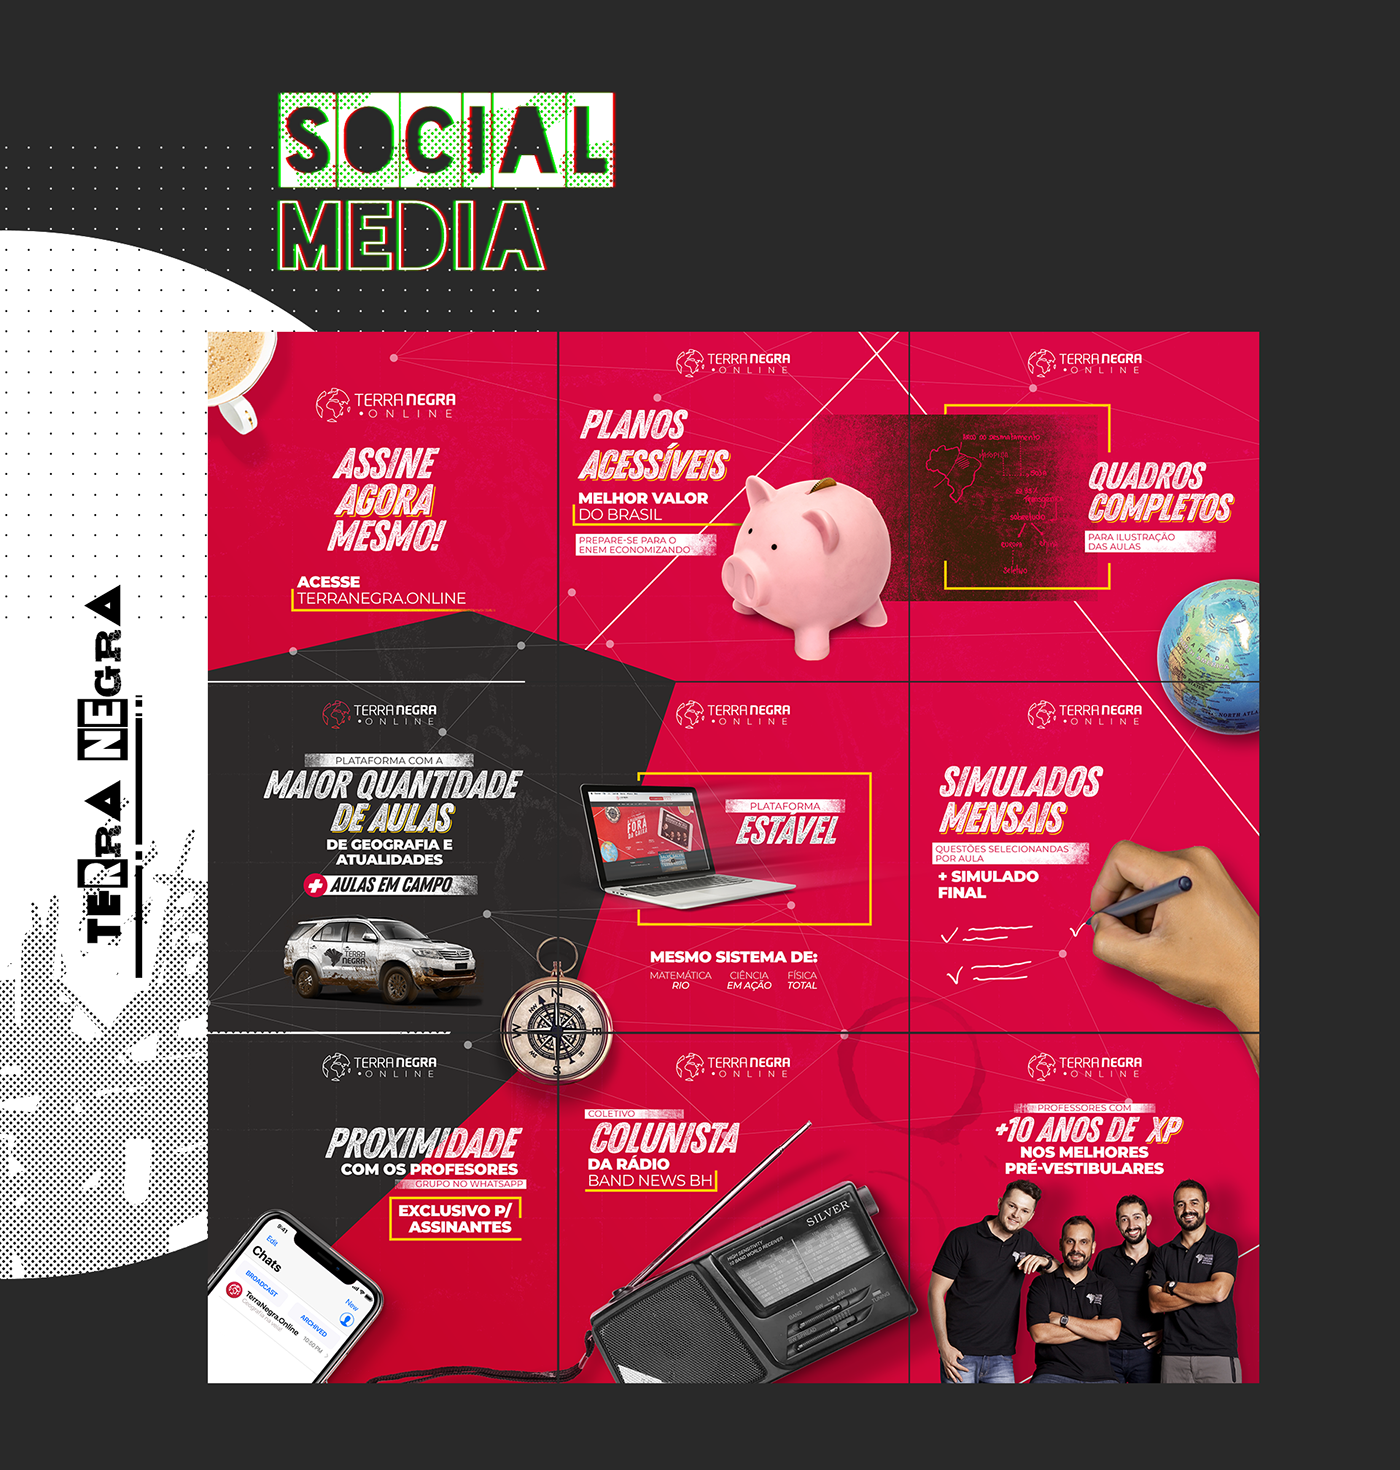 Qi Pré-vestibular terra negra social media Colapso Digital colapso portfolio Web Design